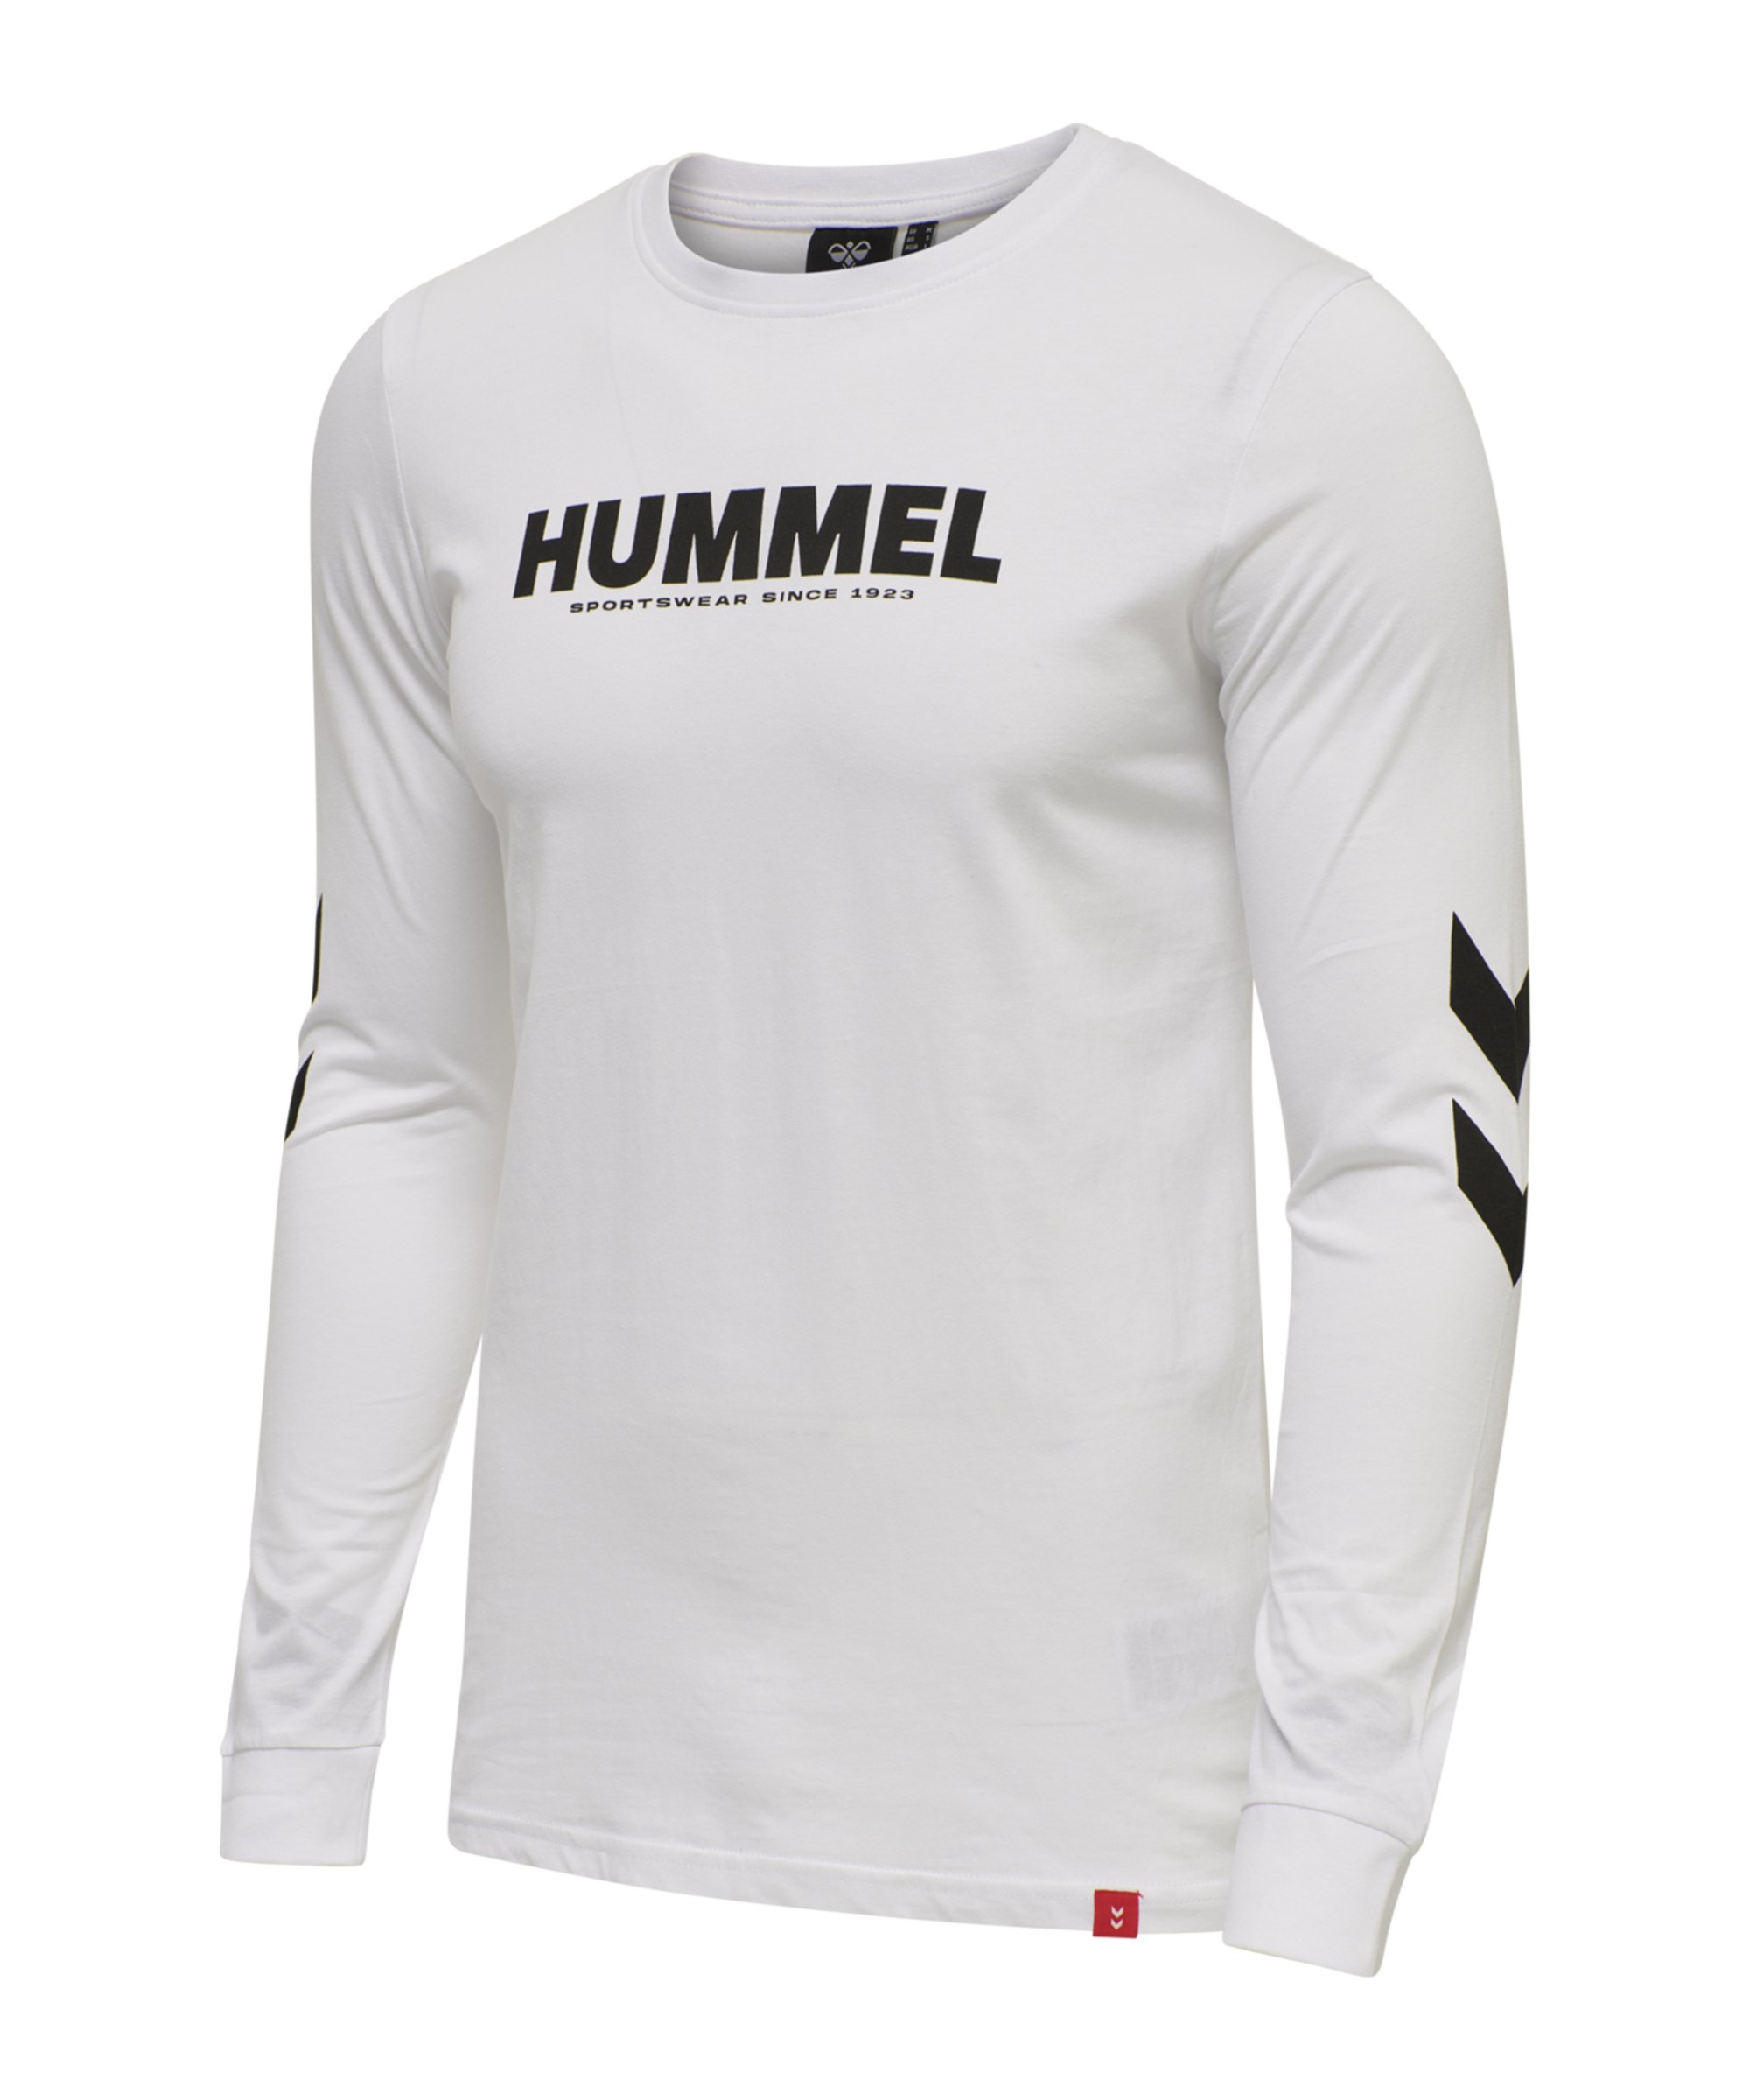 Hummel Legacy Sweatshirt Weiss F9001 - weiss